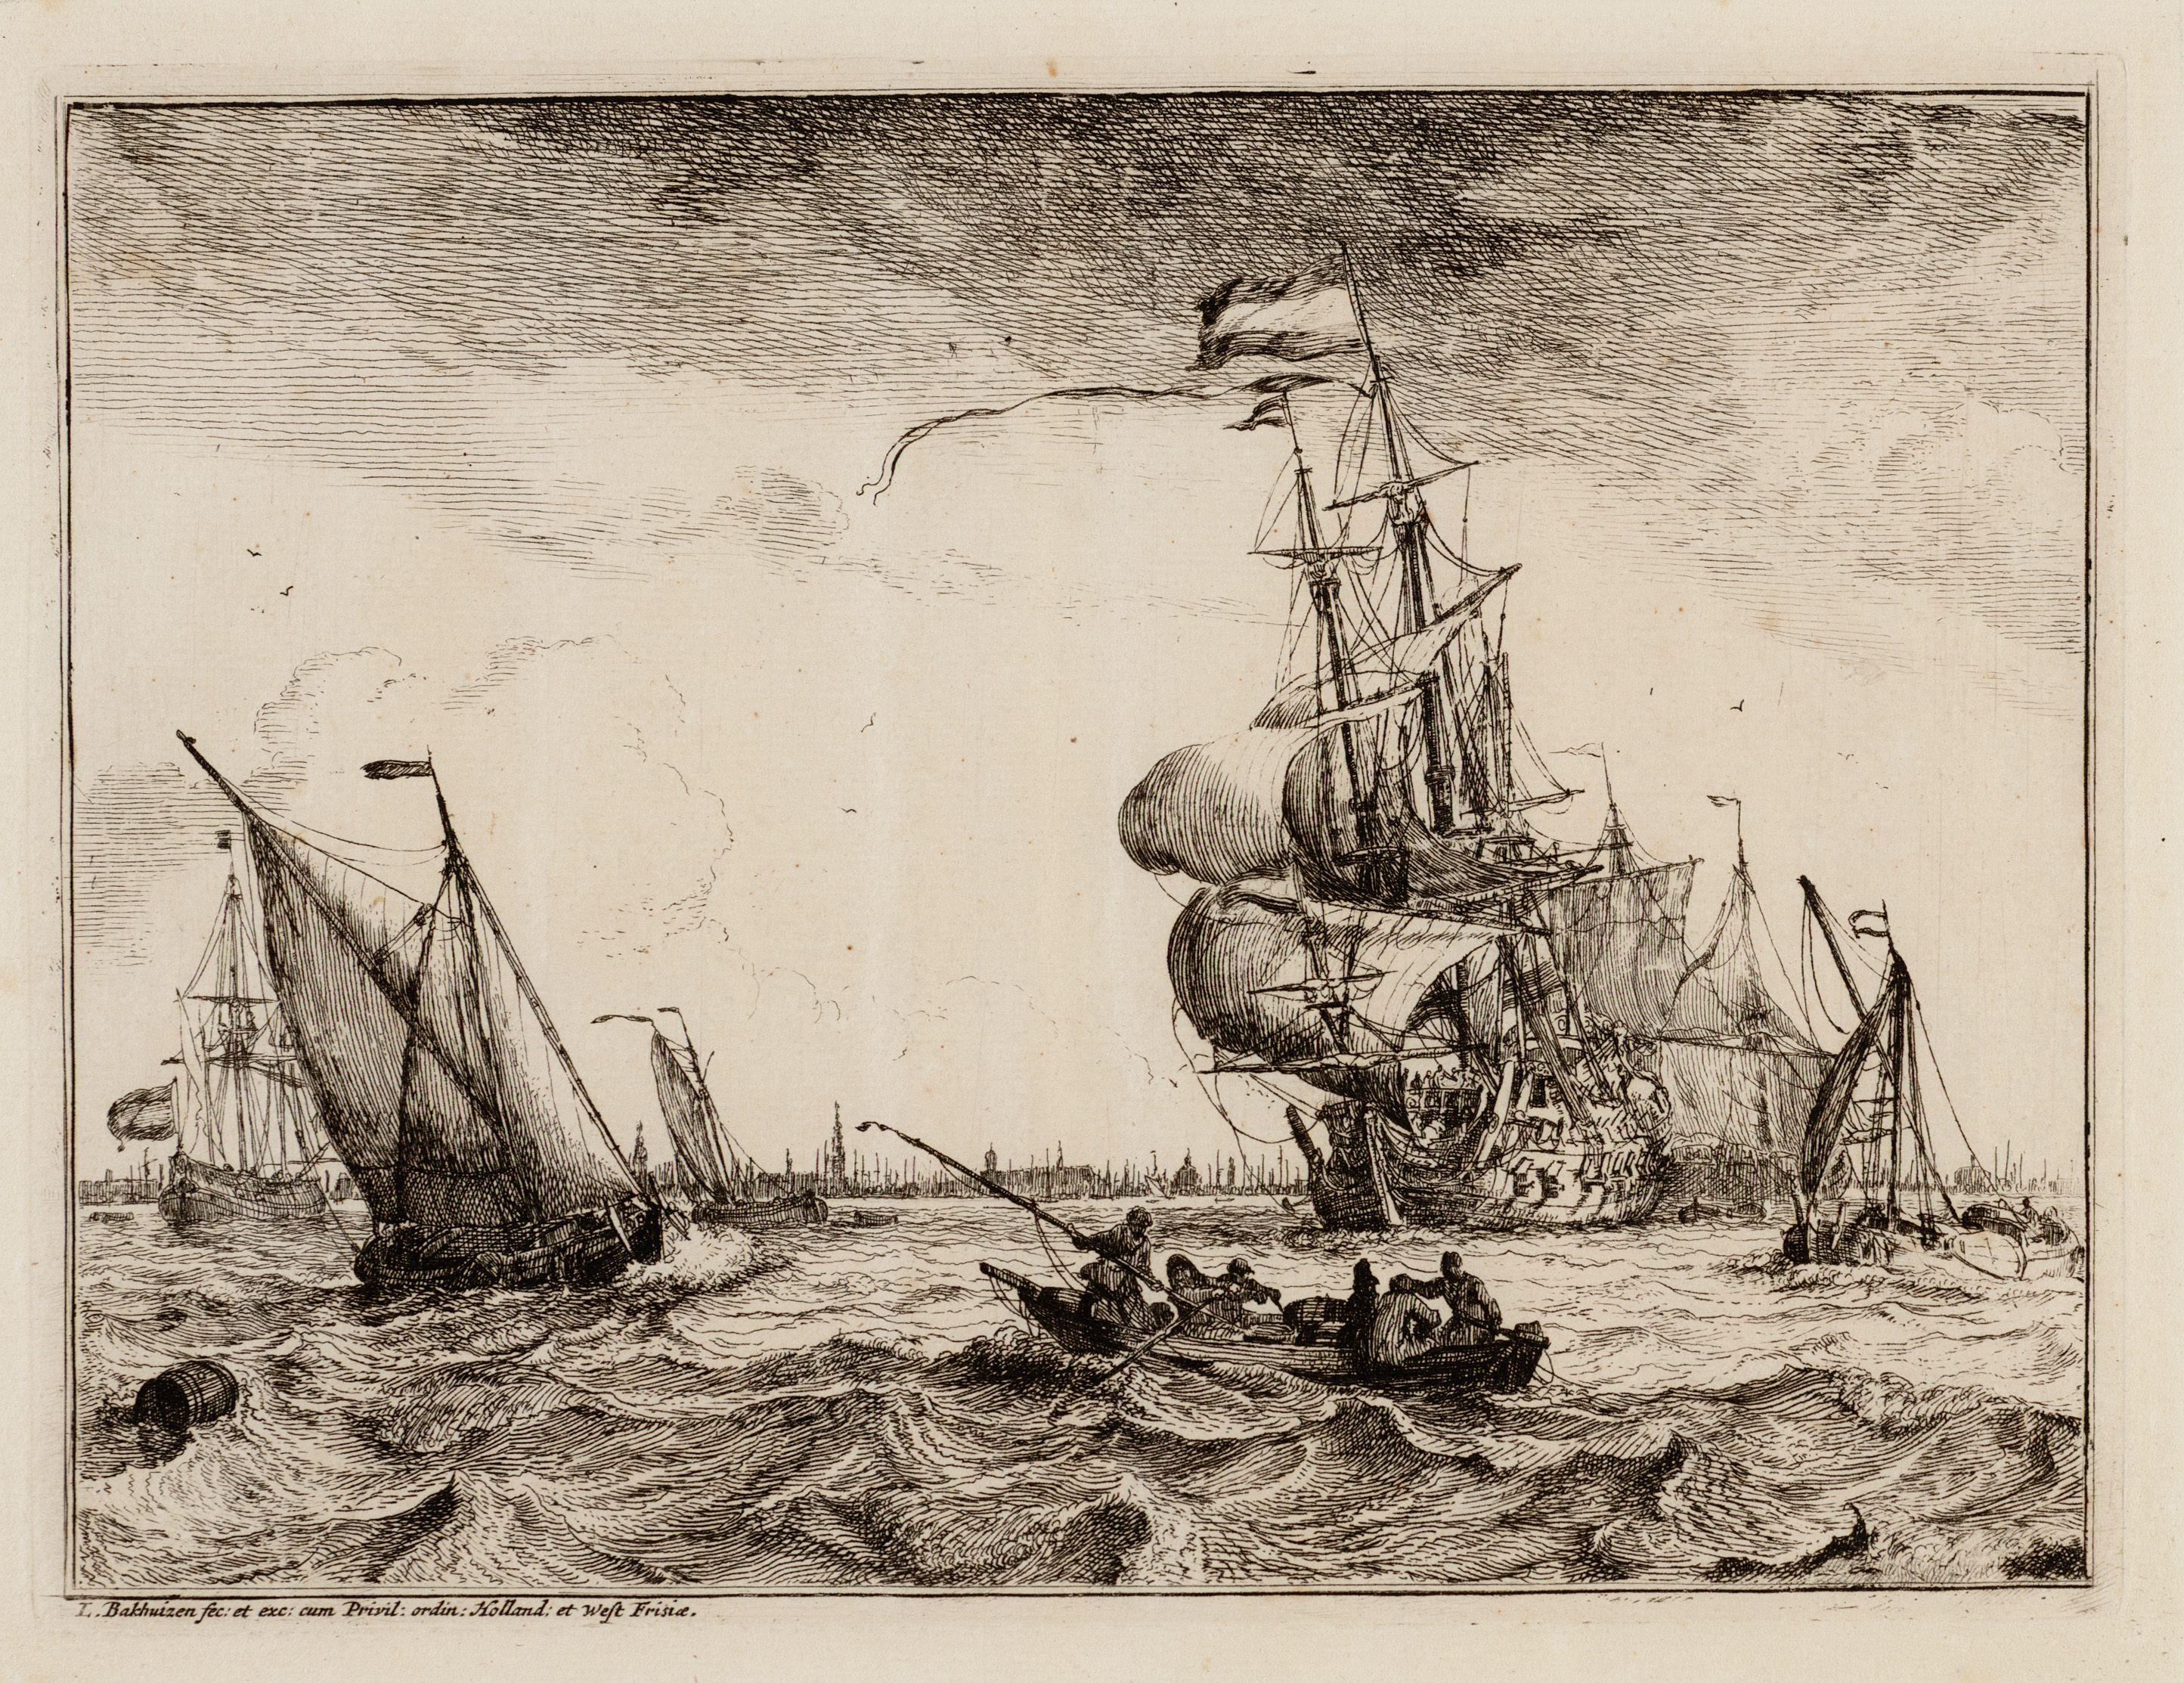 File:Bakhuizen, Ludolf (1631-1708), Afb 010097012584.jpg